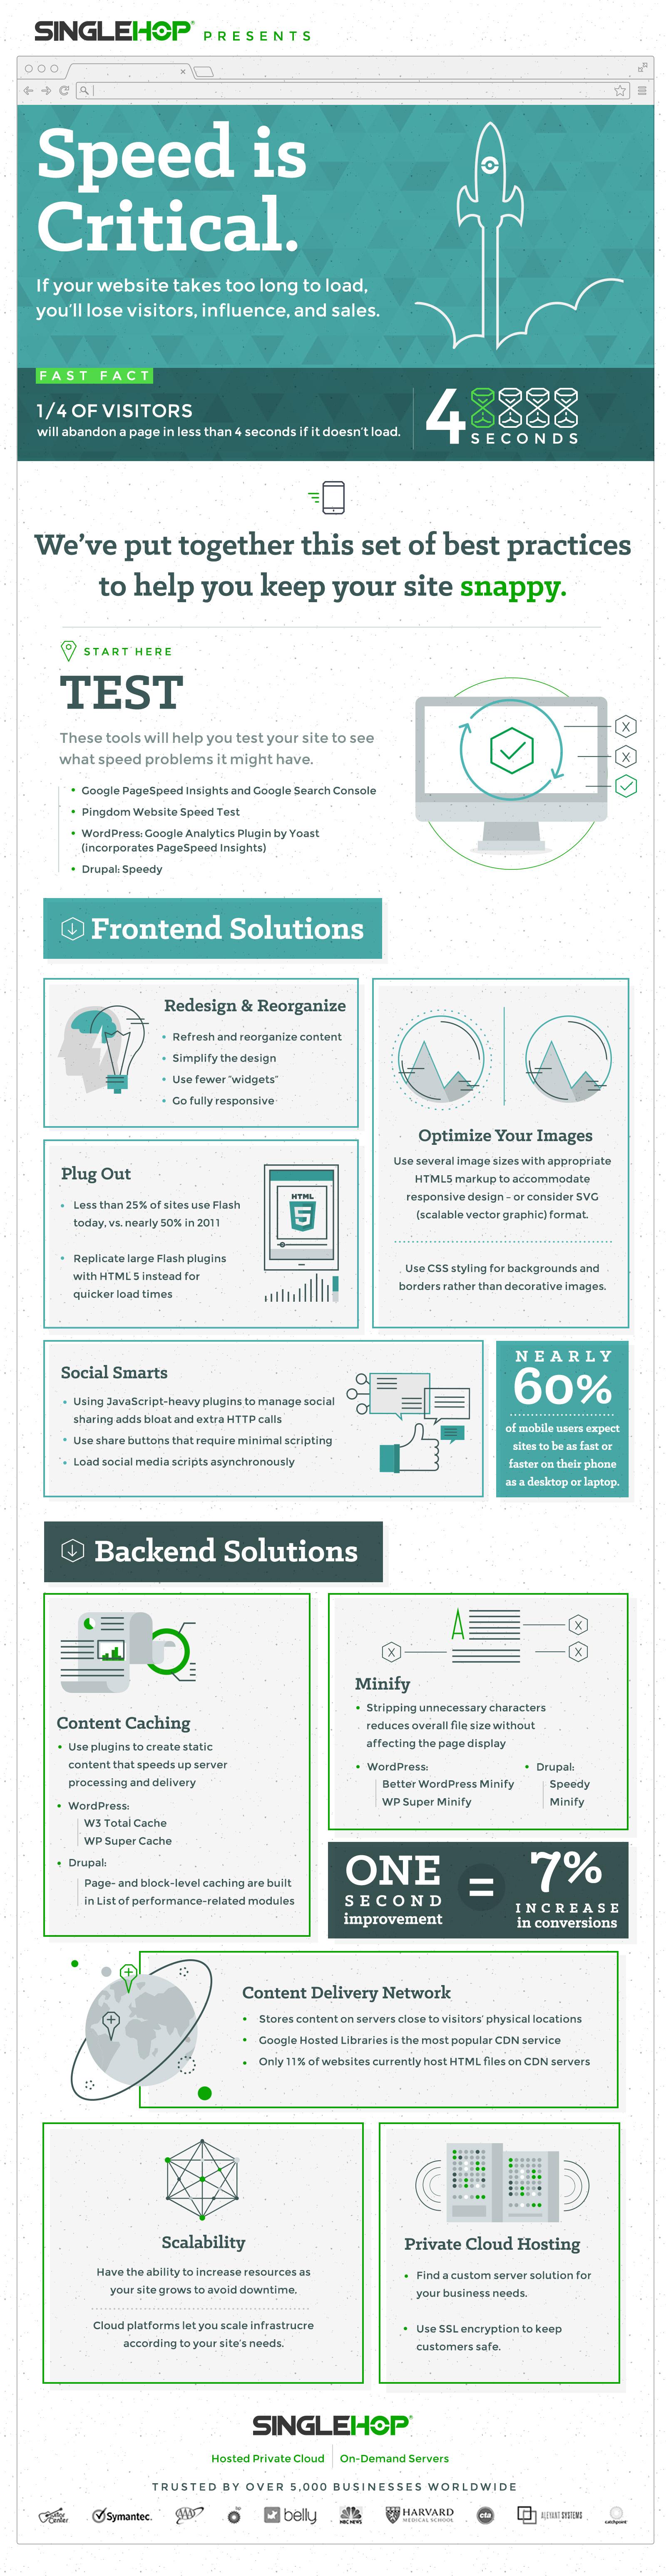 singlehop_speed_infographic (1)